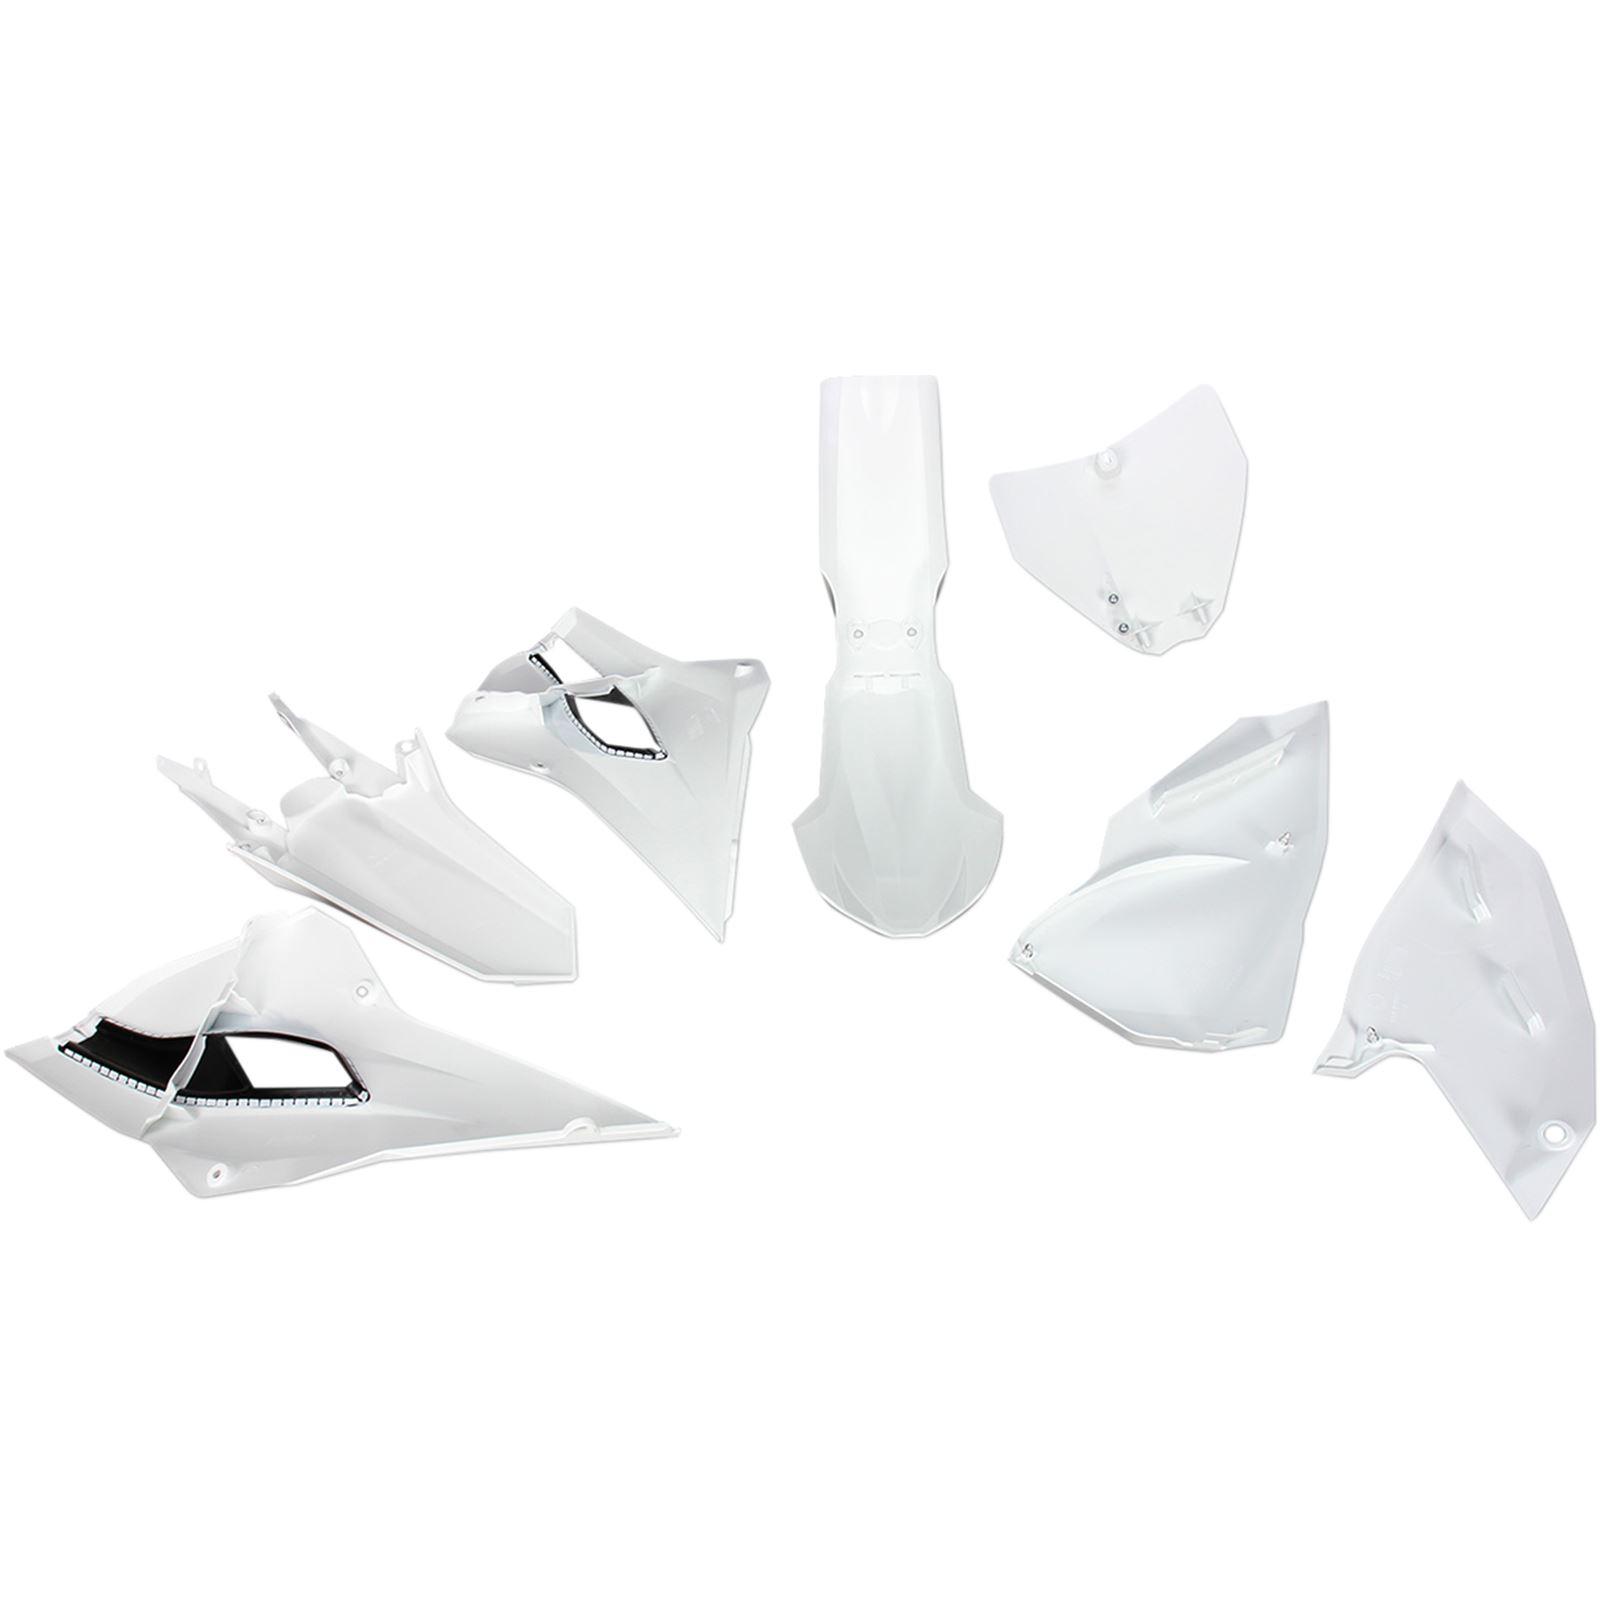 UFO Plastics Body Kit - White/Black - TC/FC